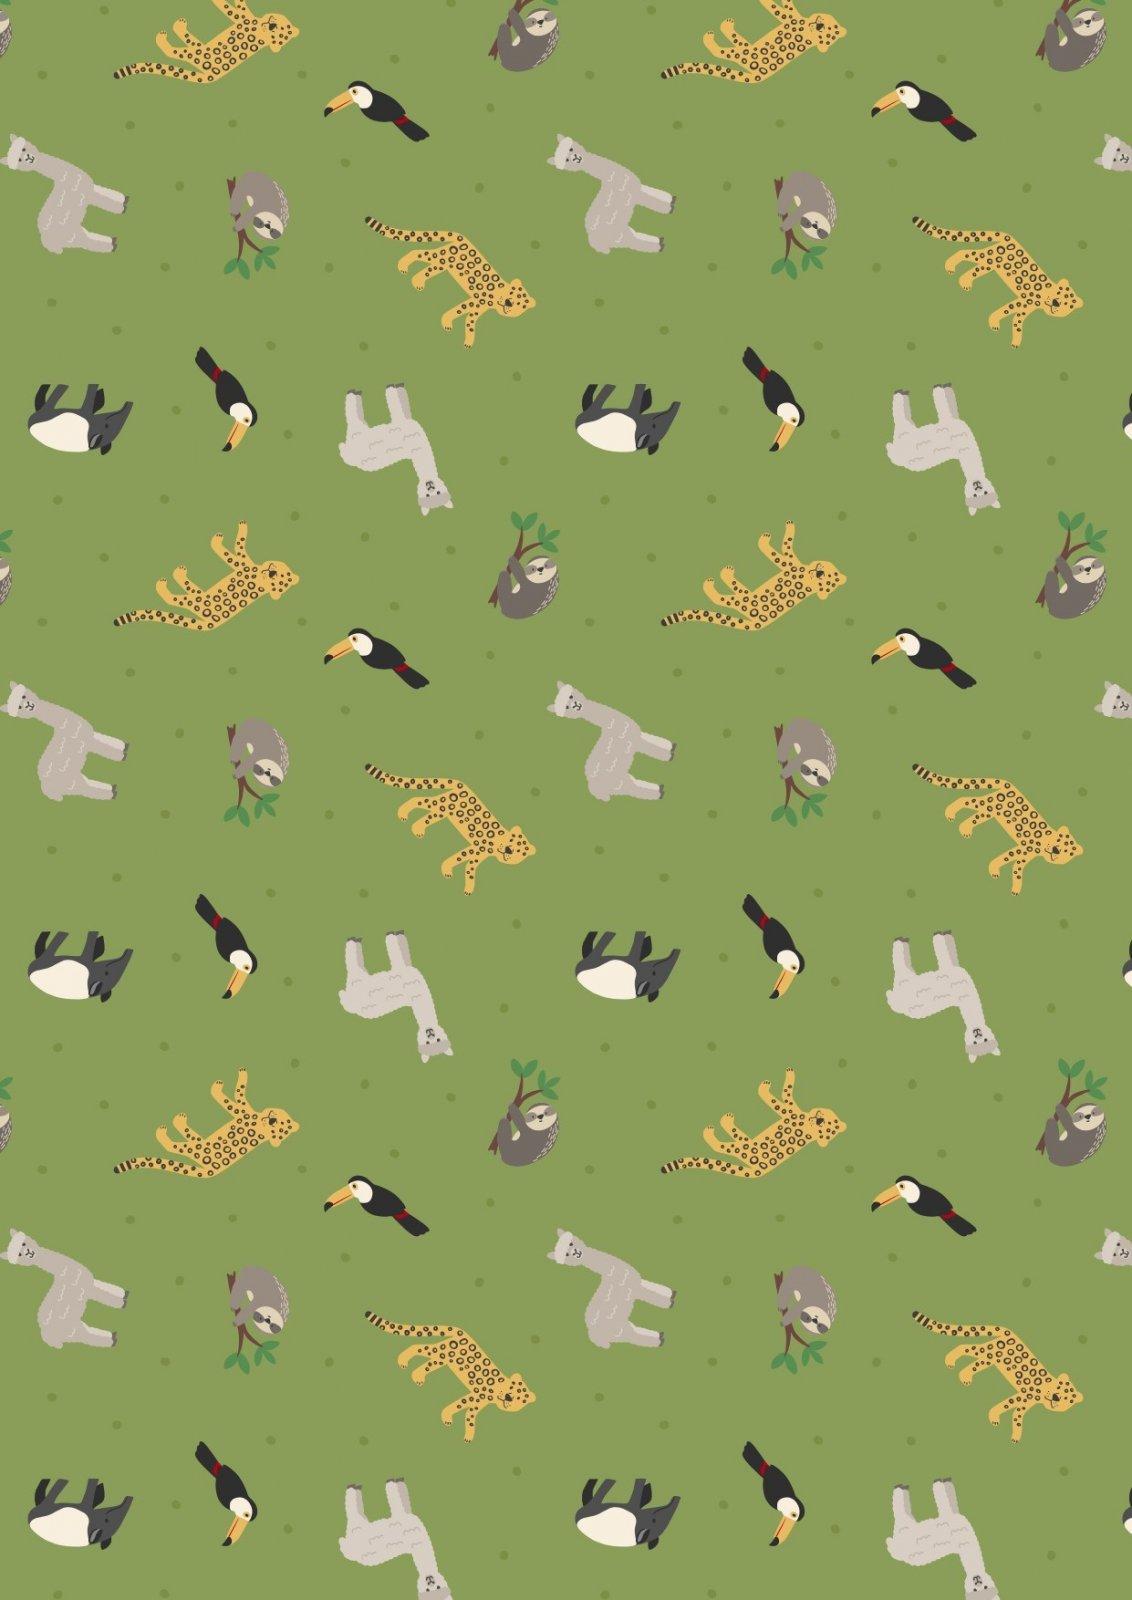 WORLD ANIMALS - S. AMERICAN SM26.2 RAINFOREST GREEN